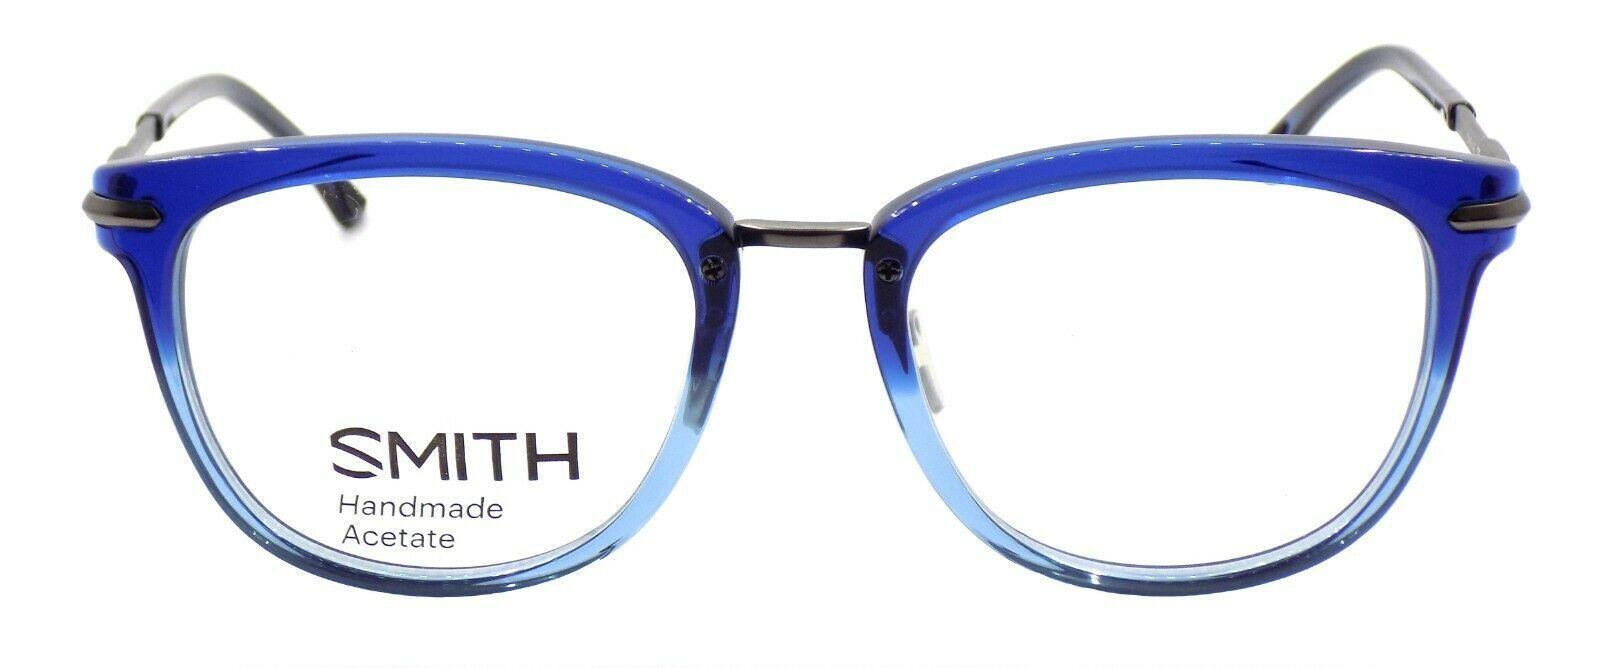 SMITH Optics Quinlan IOV Unisex Eyeglasses Frames 51-19-140 Blue Crystal Split